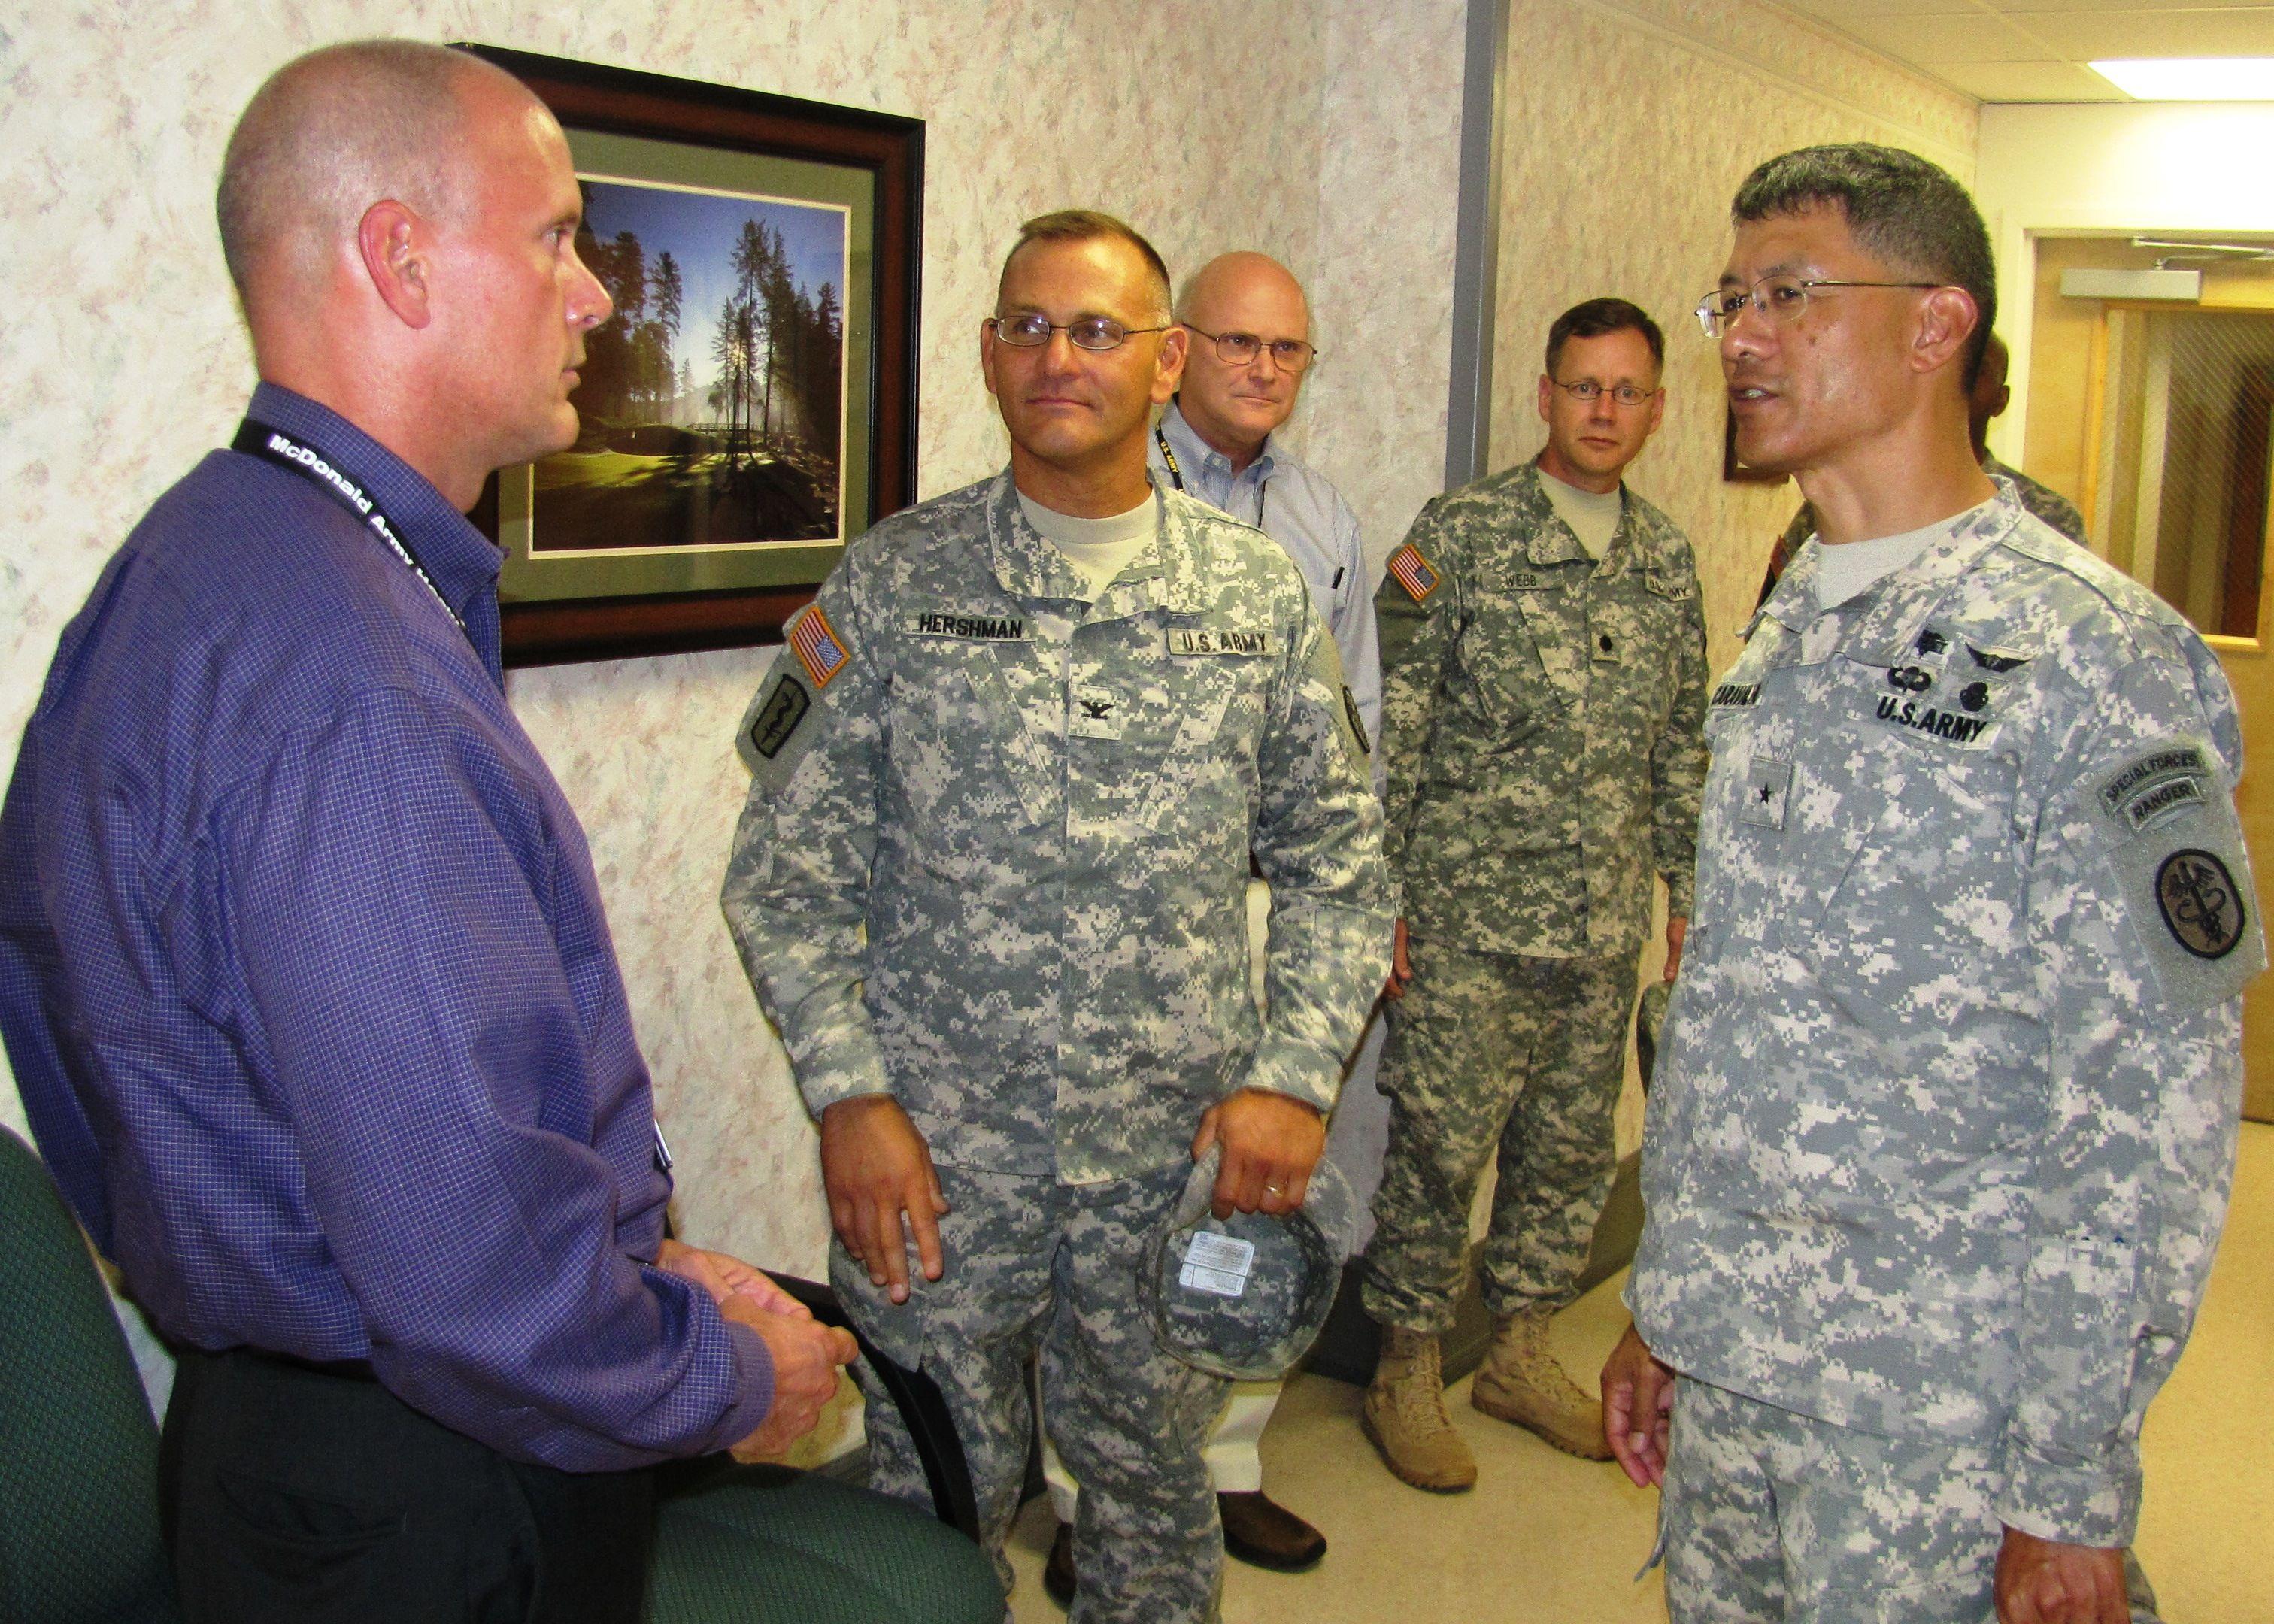 MCDONALD ARMY HEALTH CENTER, FORT EUSTIS, VA As Medical